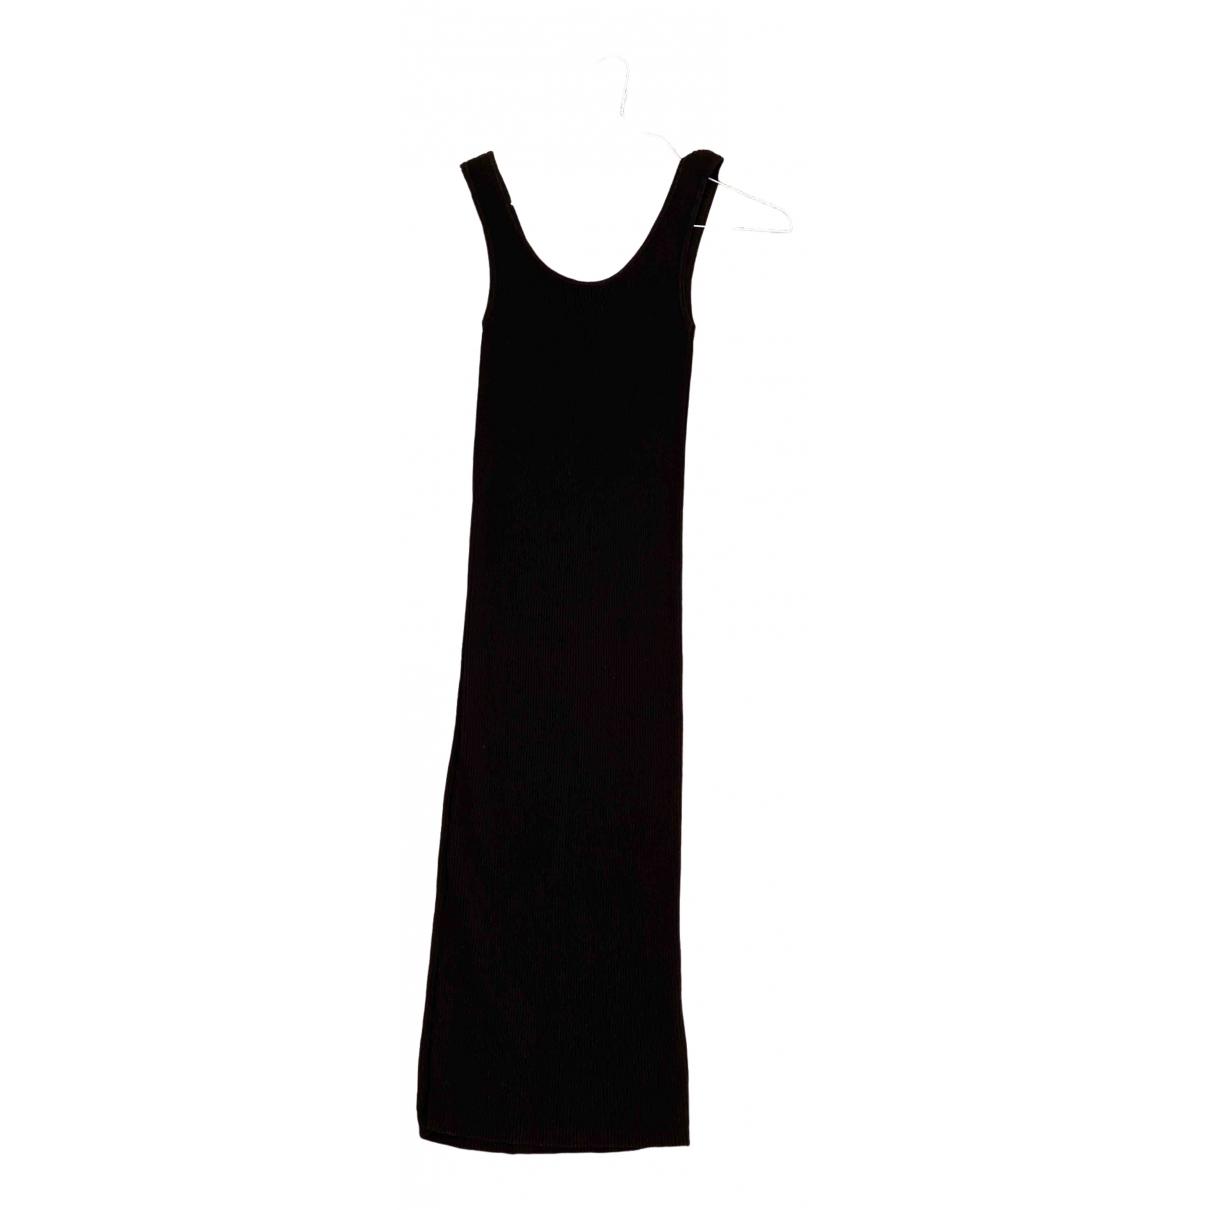 Set - Robe   pour femme en coton - elasthane - noir